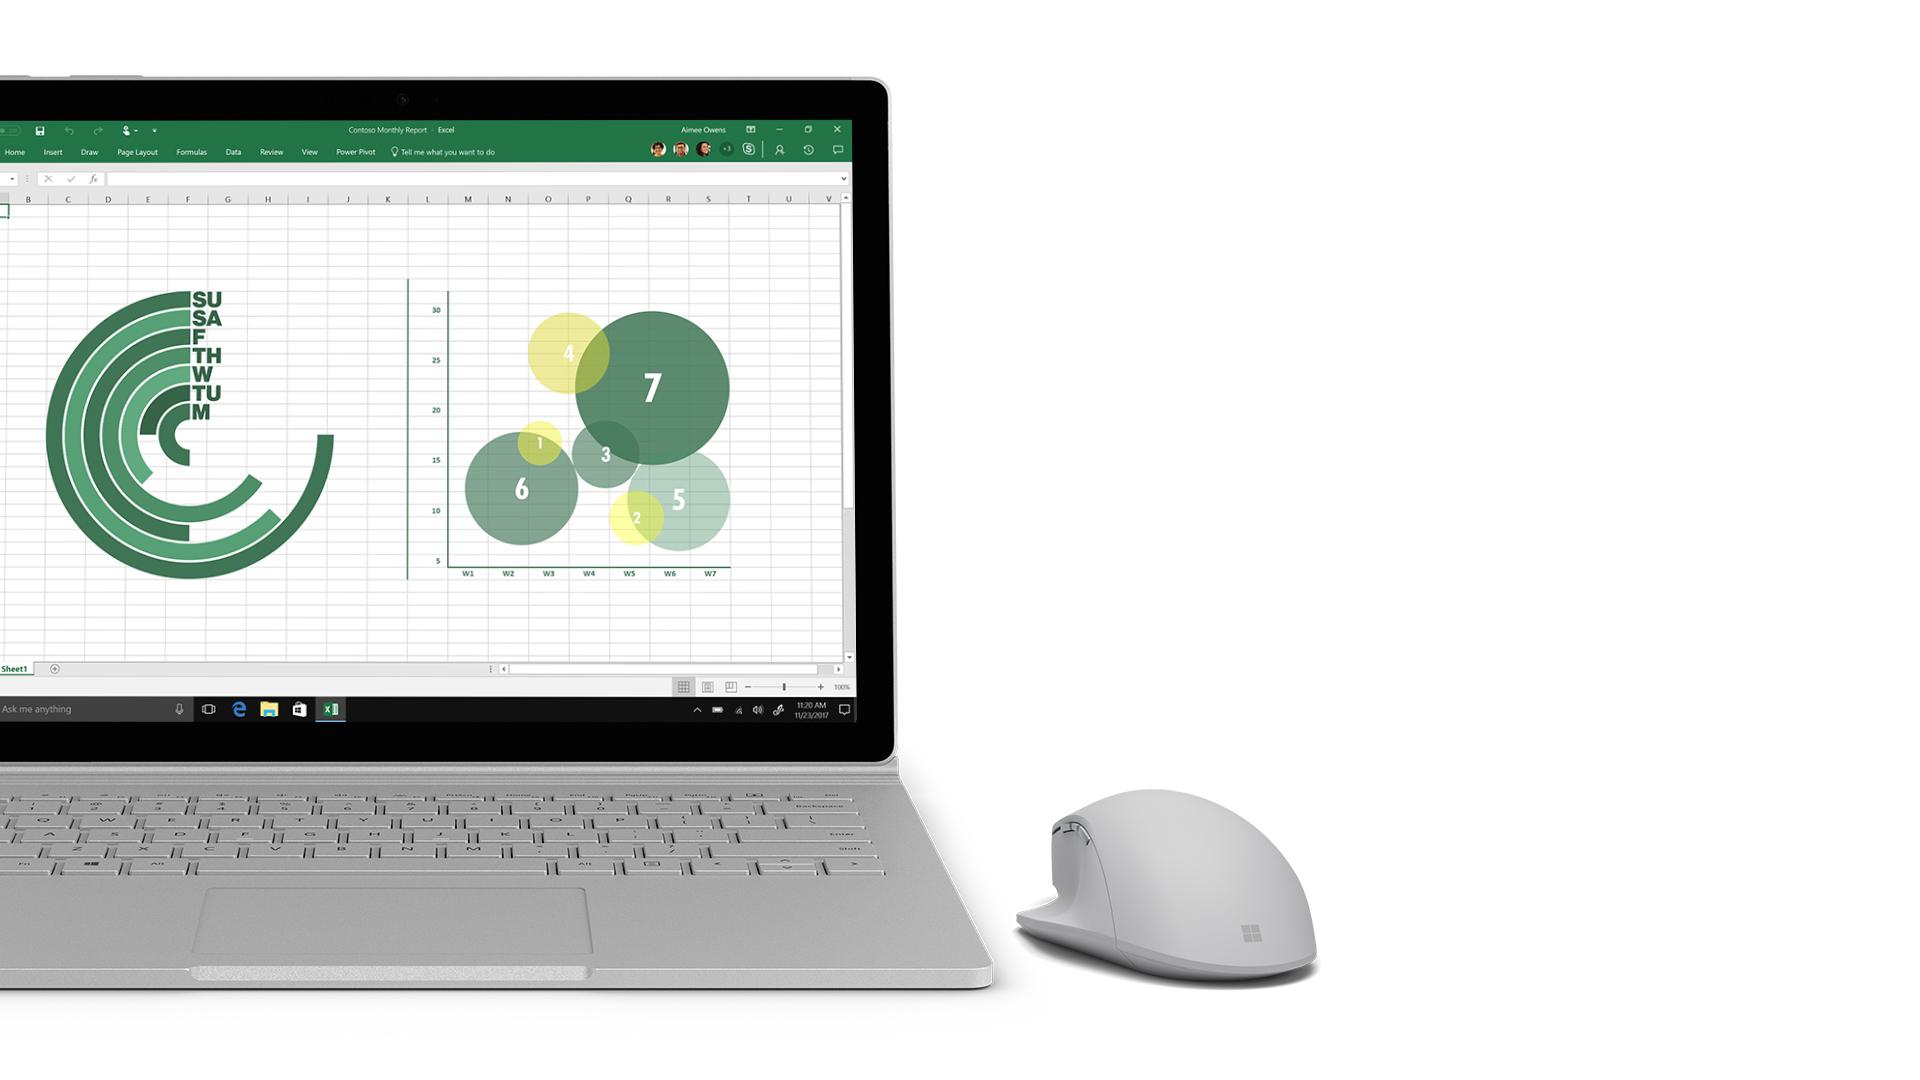 Surface 上的 Excel 螢幕擷取畫面。